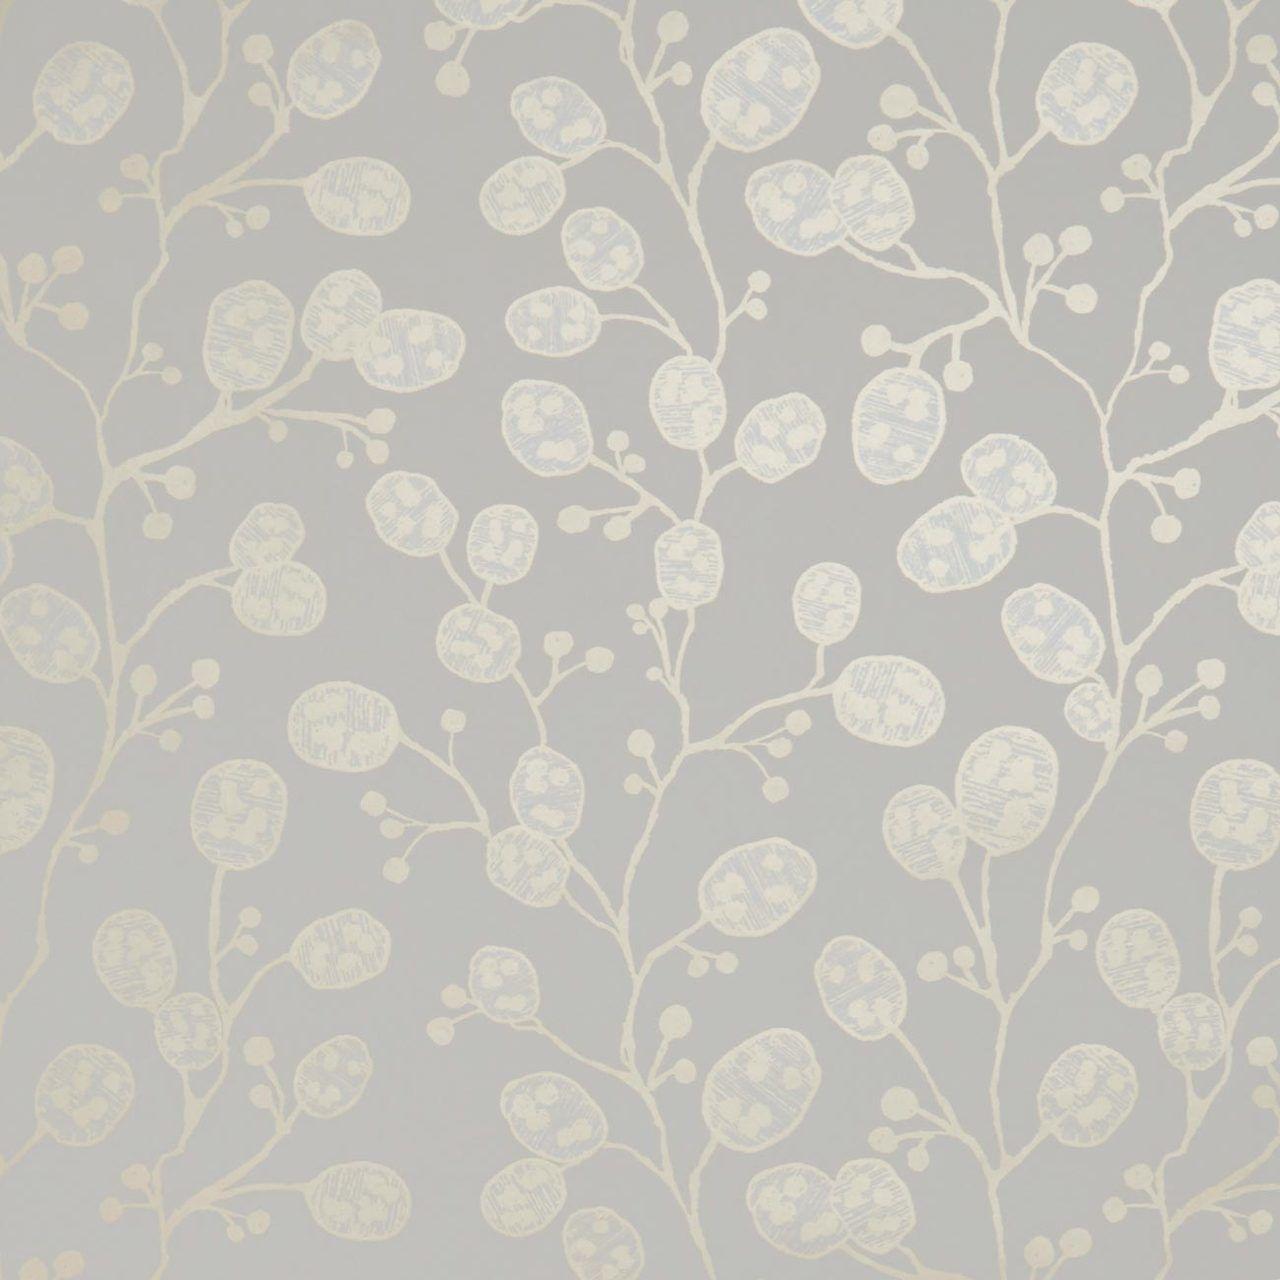 Honesty Ivory Gold Wallpaper Roll Gold Wallpaper Animal Print Wallpaper